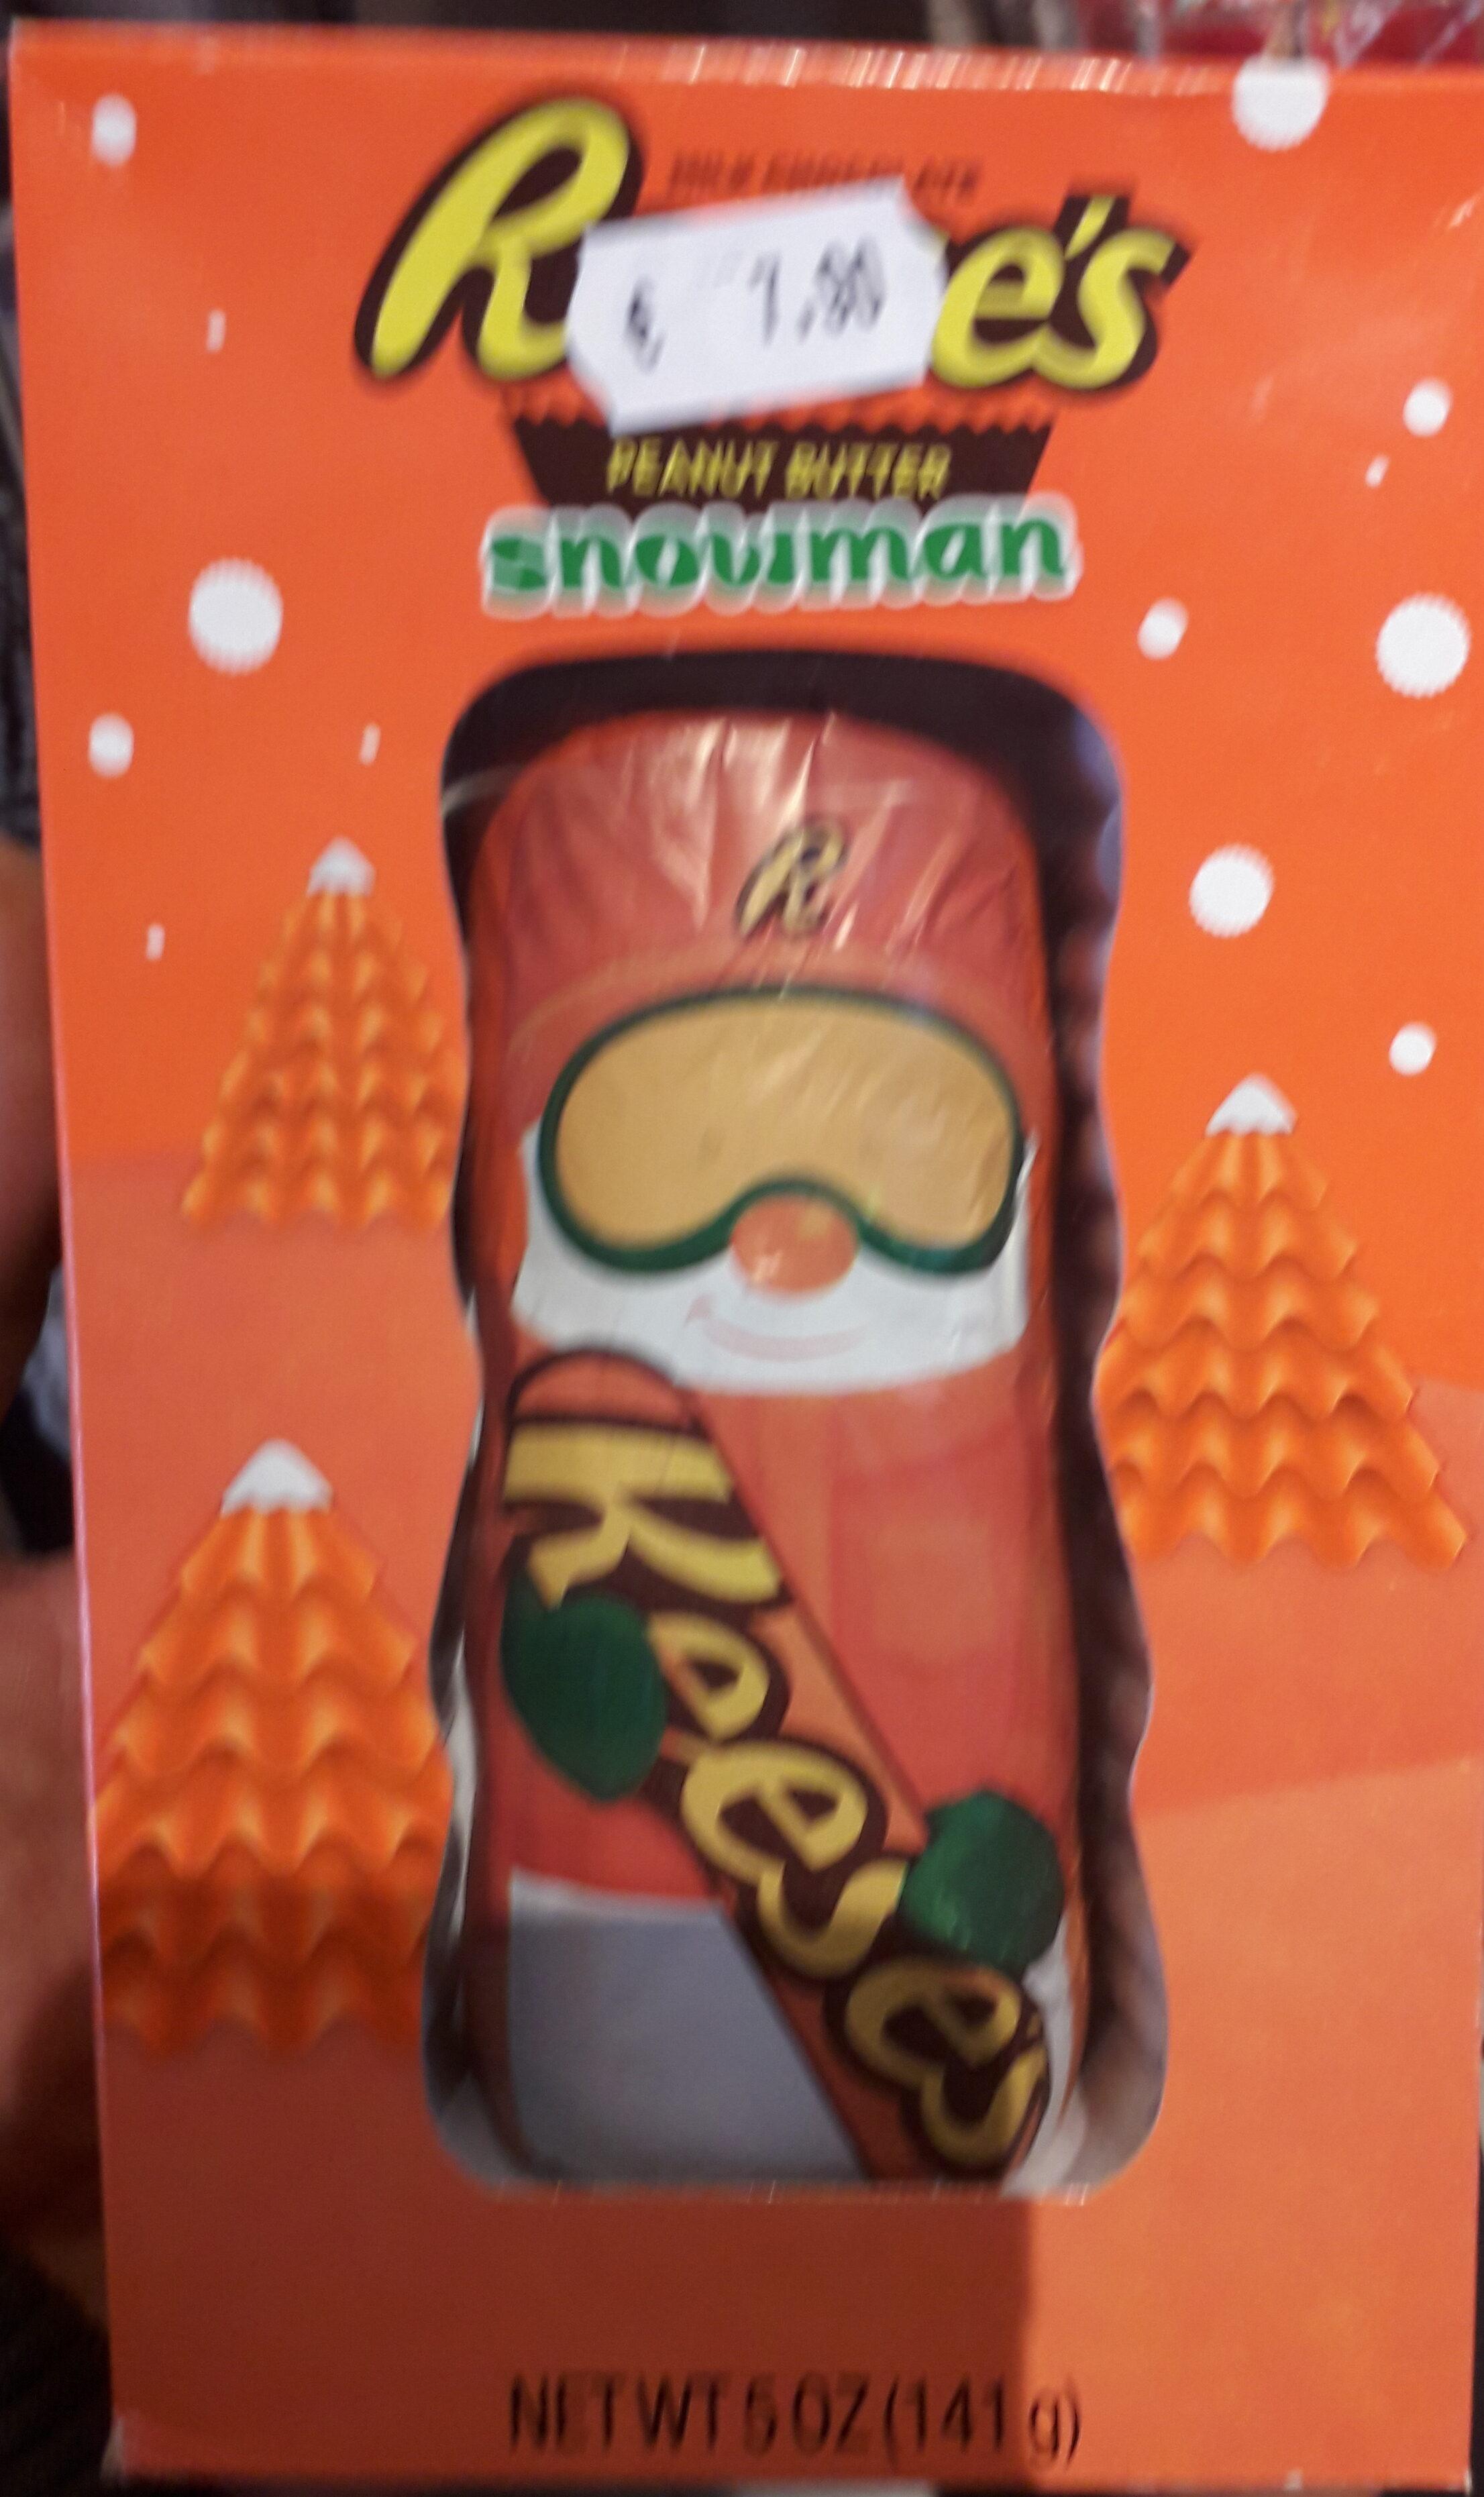 Reese's Milk chocolate peanut butter snowman - Produit - fr